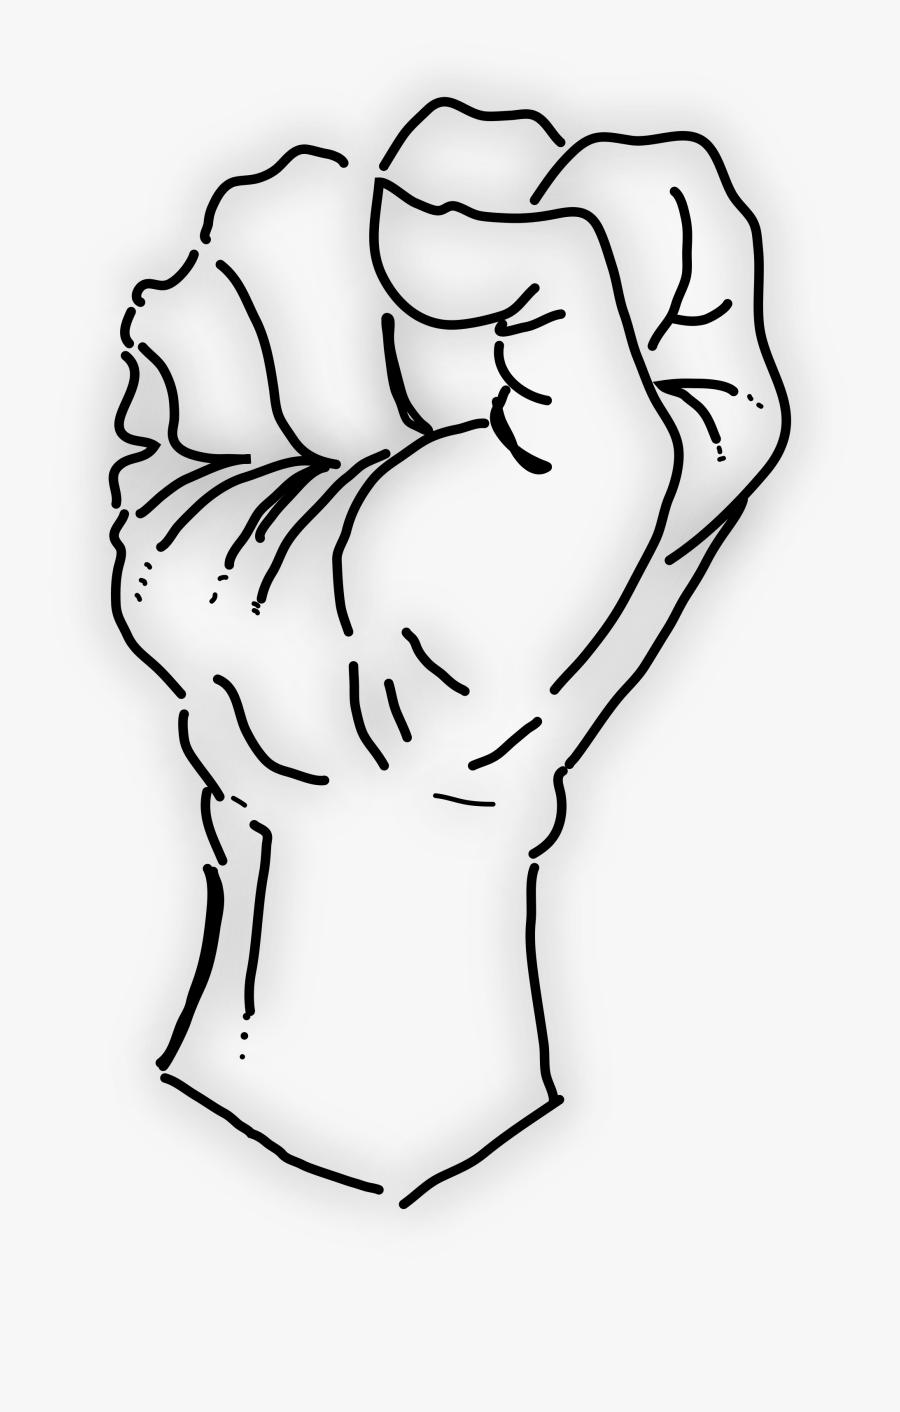 filefist vector image gambar kepalan tangan png free transparent clipart clipartkey gambar kepalan tangan png